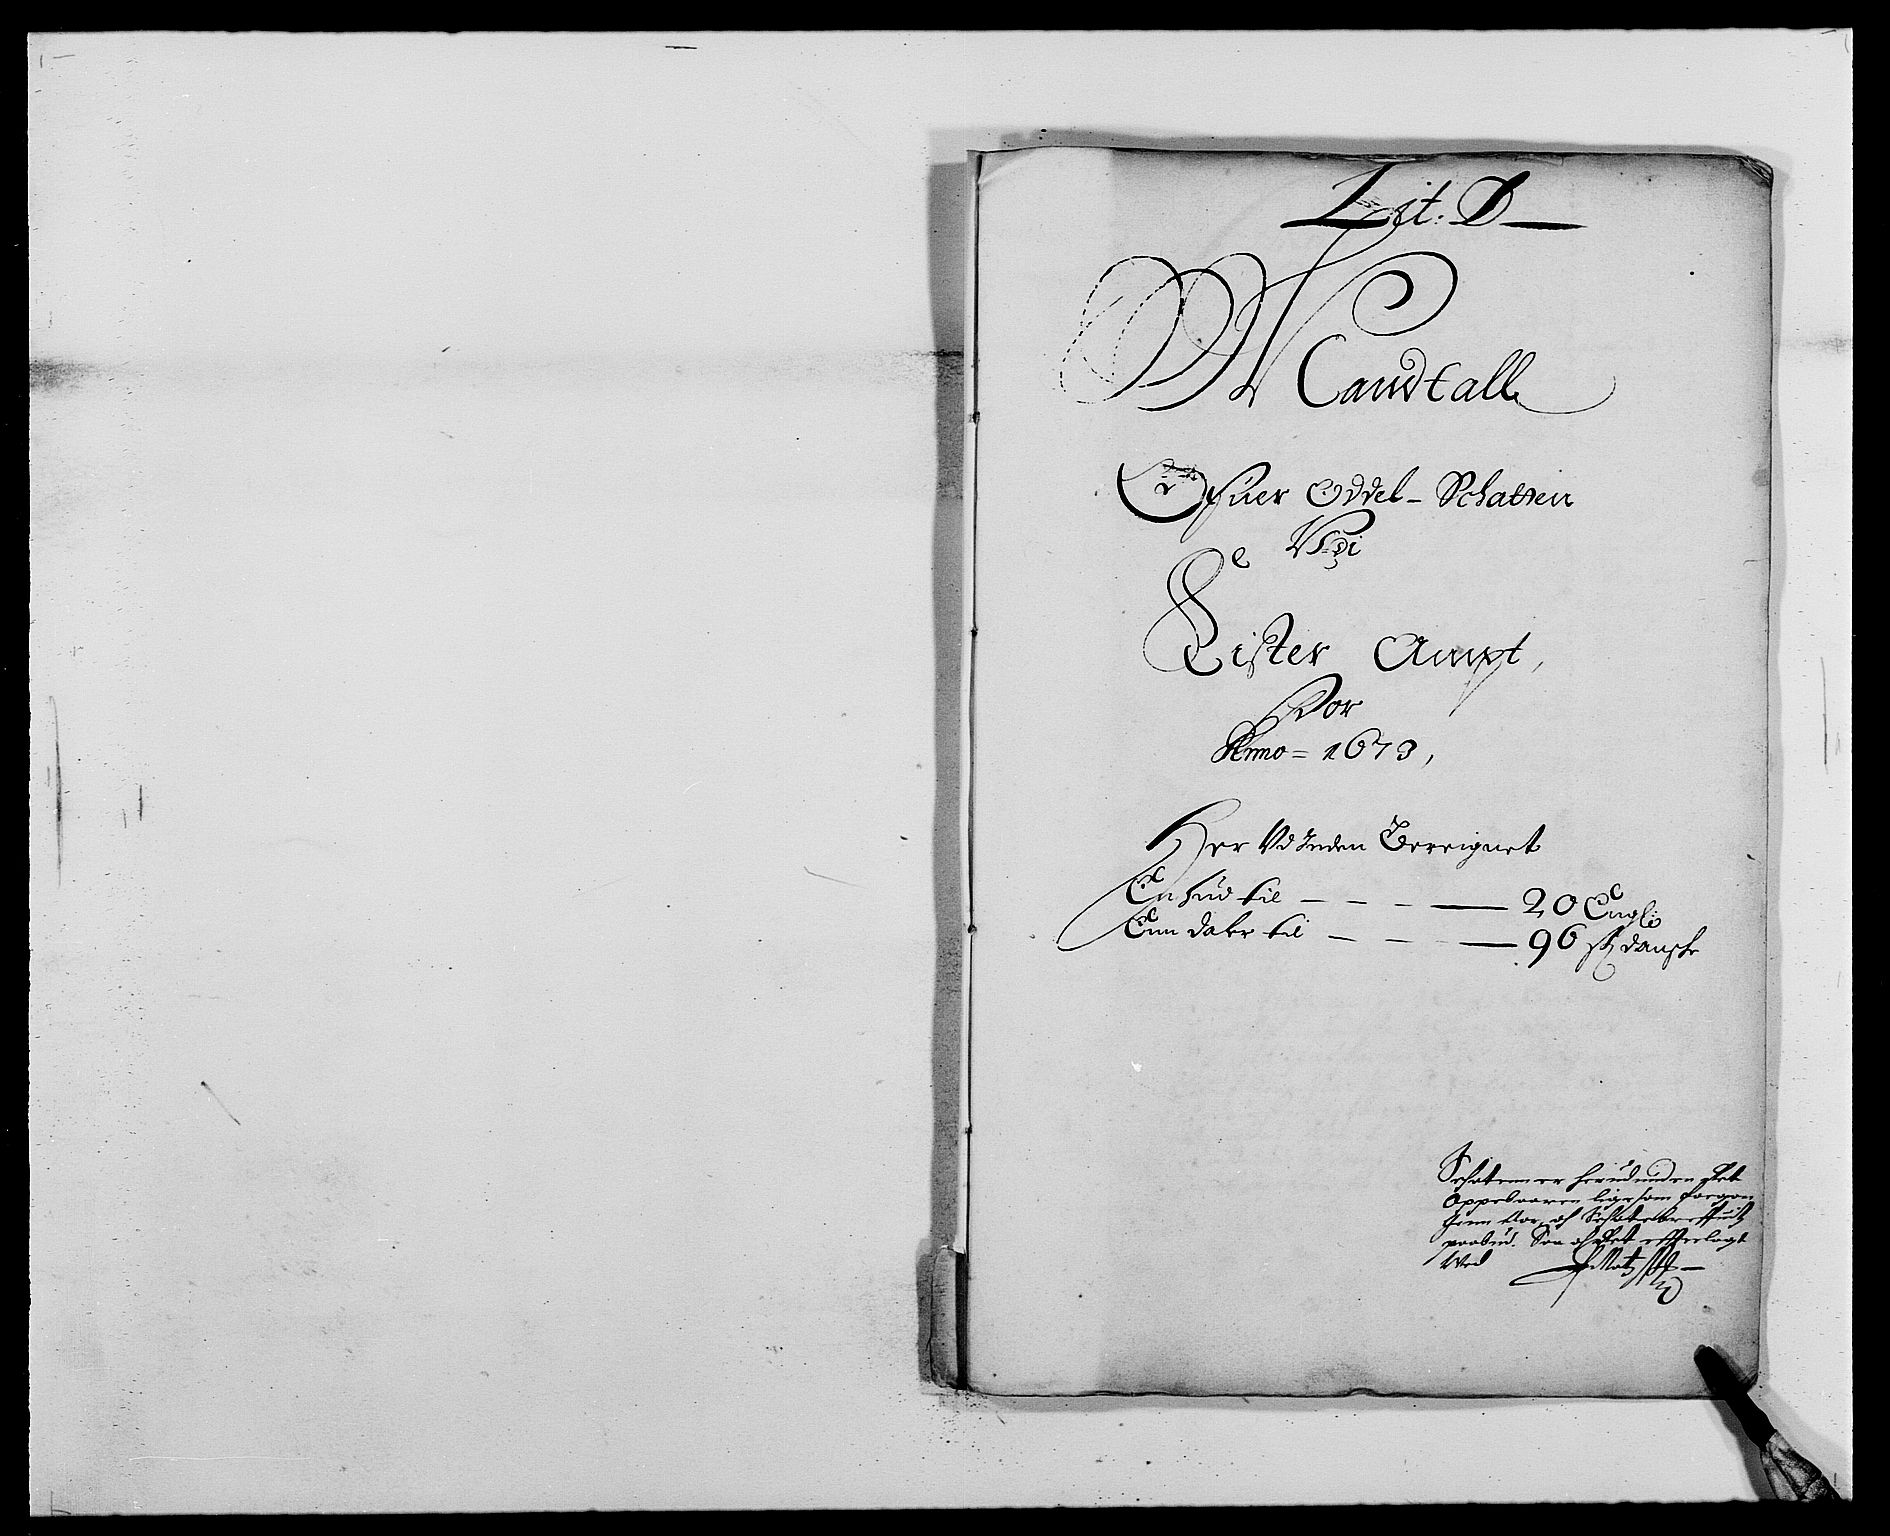 RA, Rentekammeret inntil 1814, Reviderte regnskaper, Fogderegnskap, R41/L2528: Fogderegnskap Lista, 1673-1674, s. 132